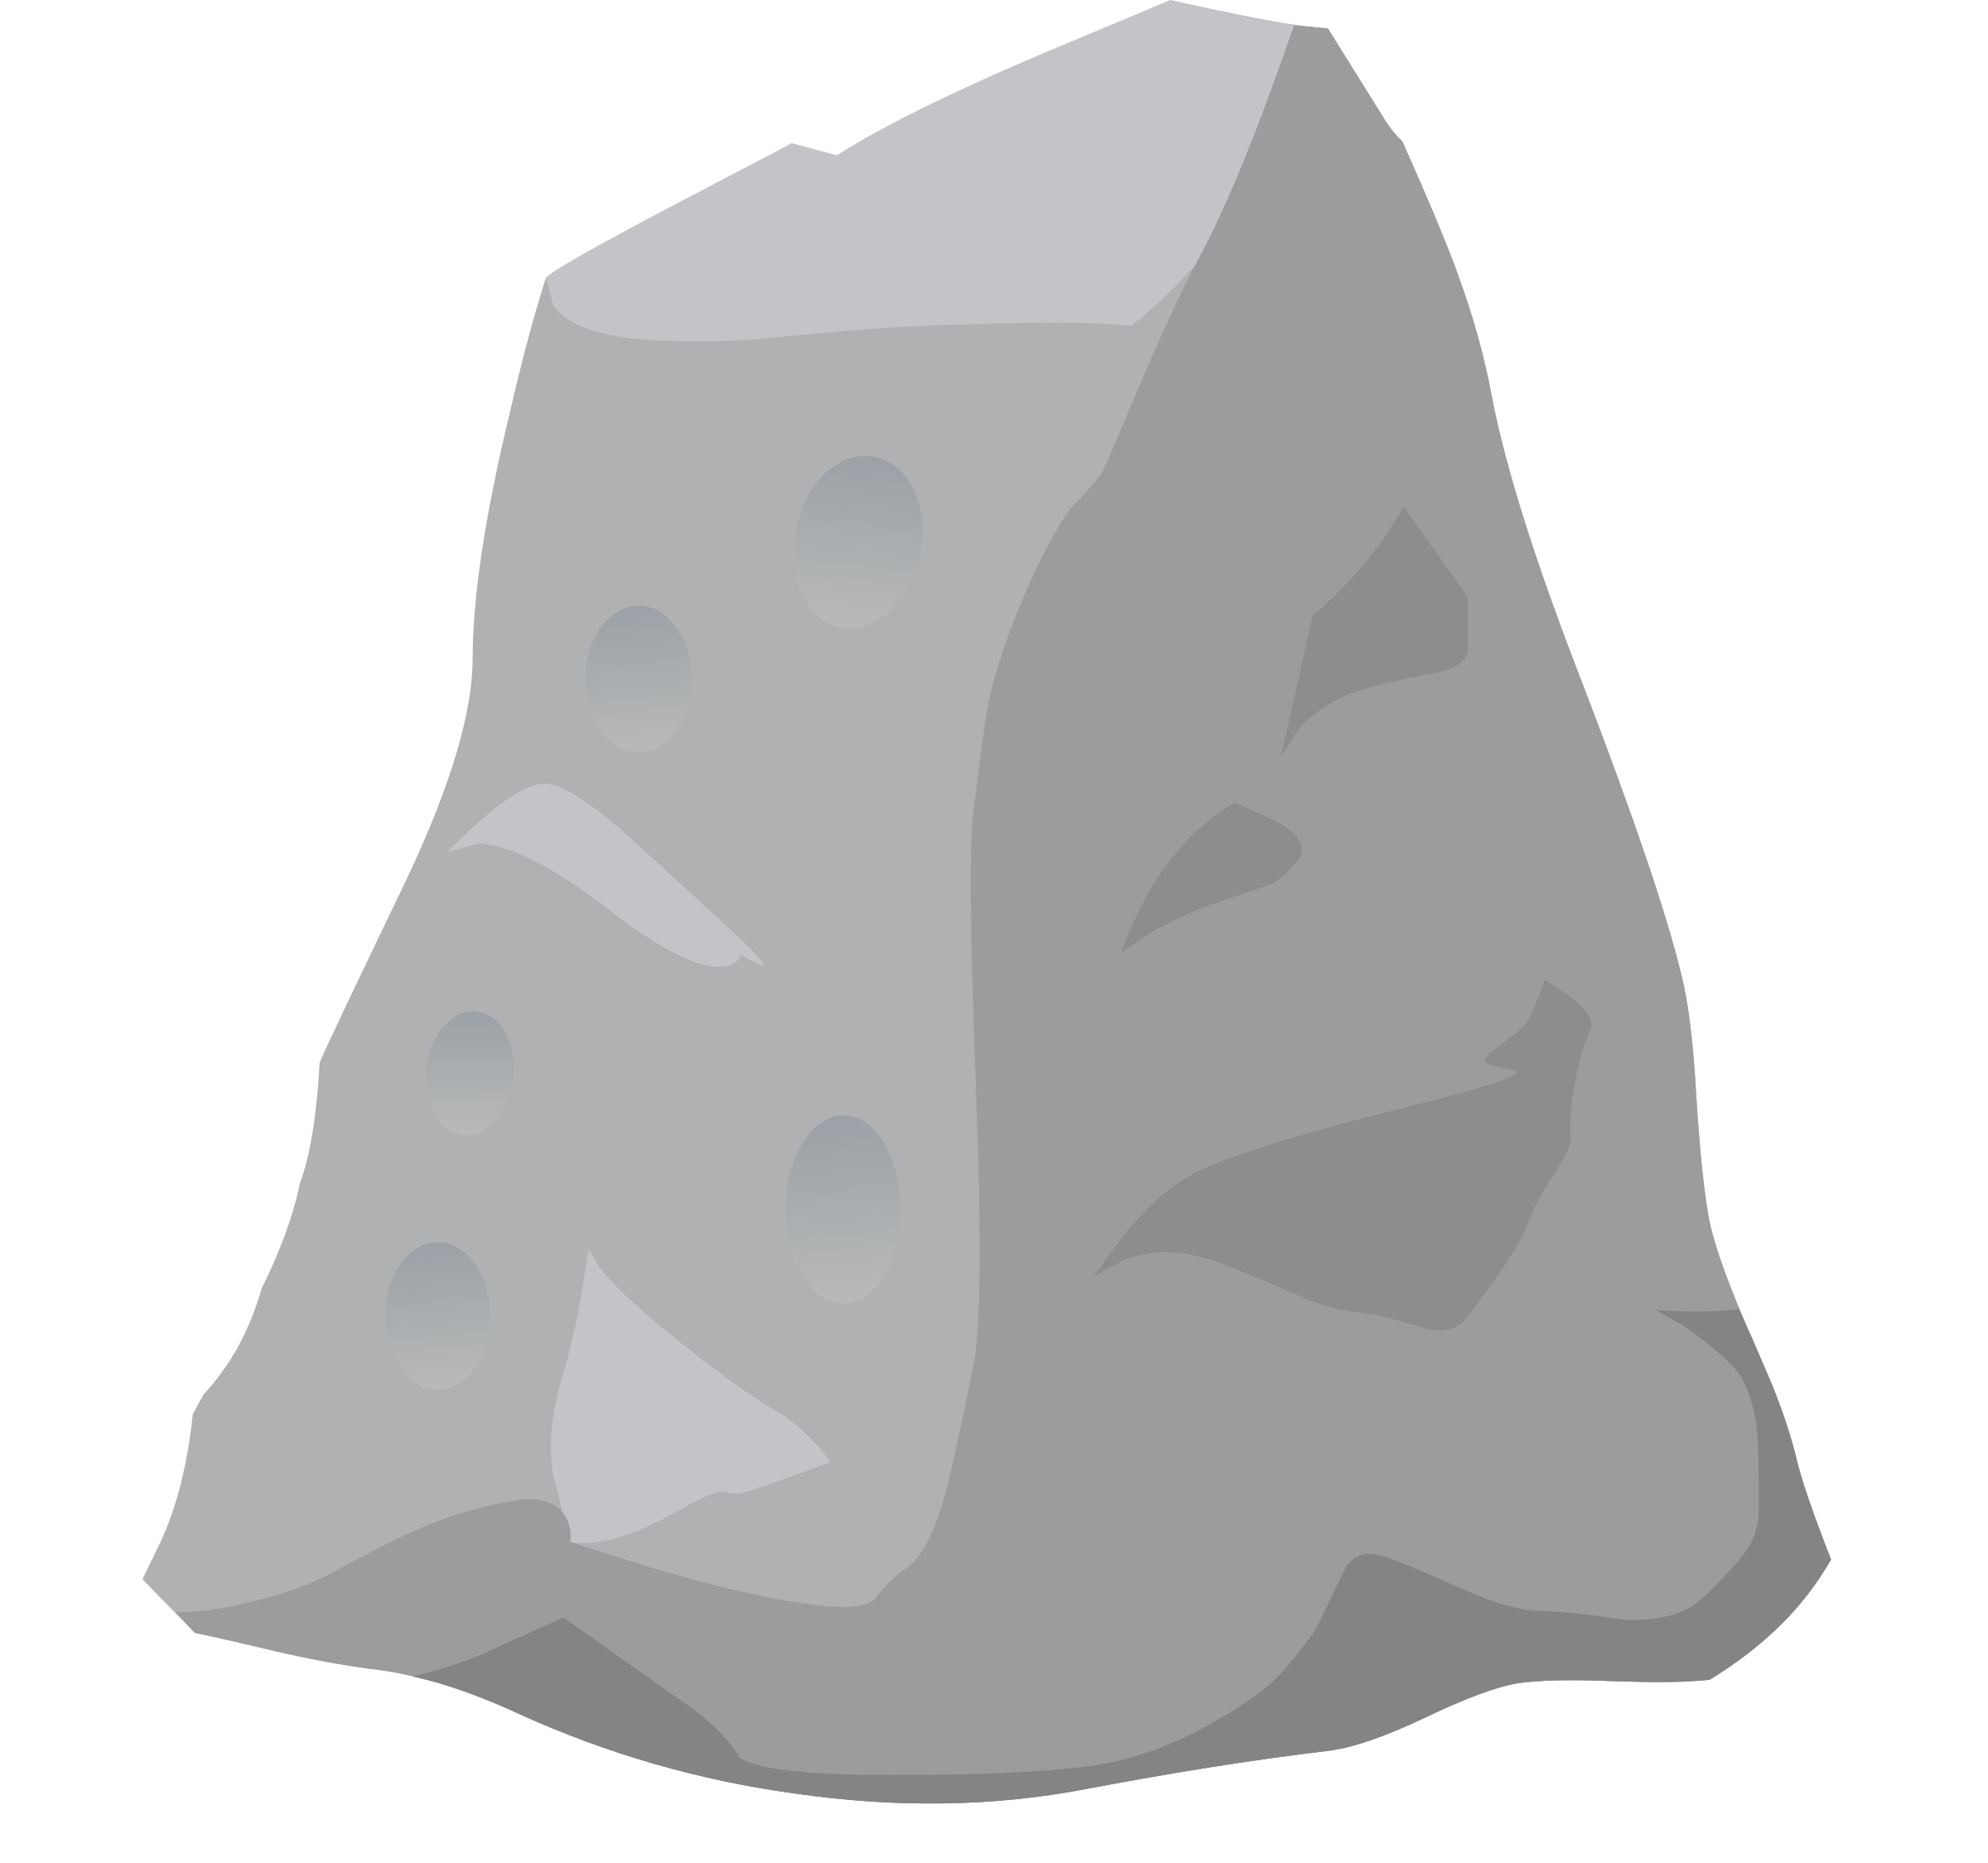 Rock Clipart & Rock Clip Art Images.